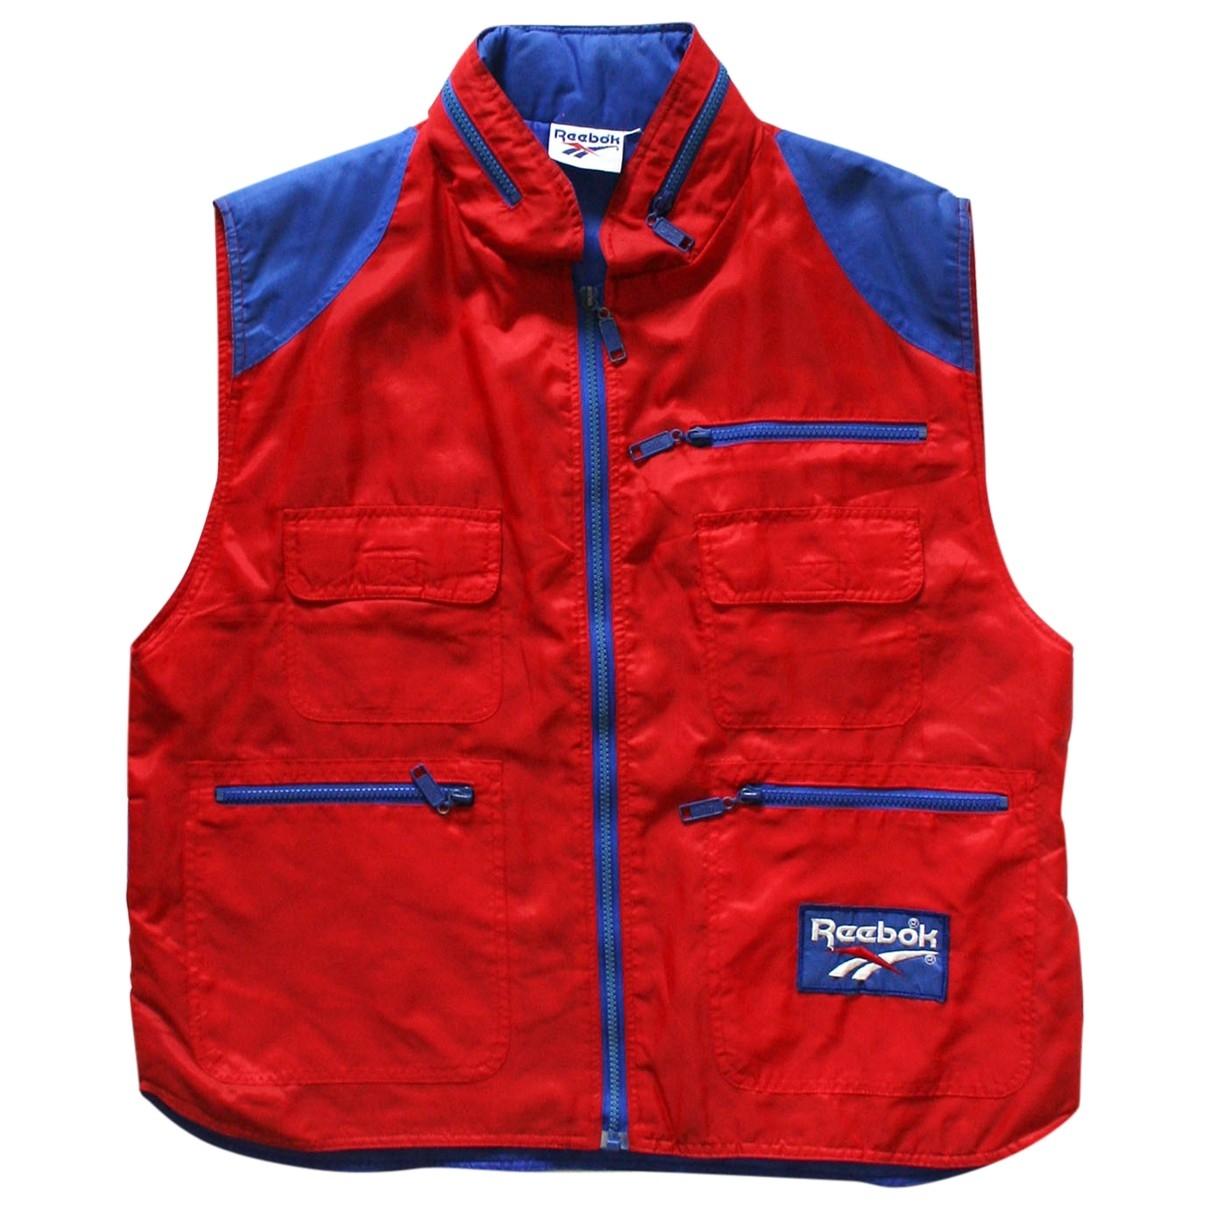 Reebok \N Red jacket  for Men L International